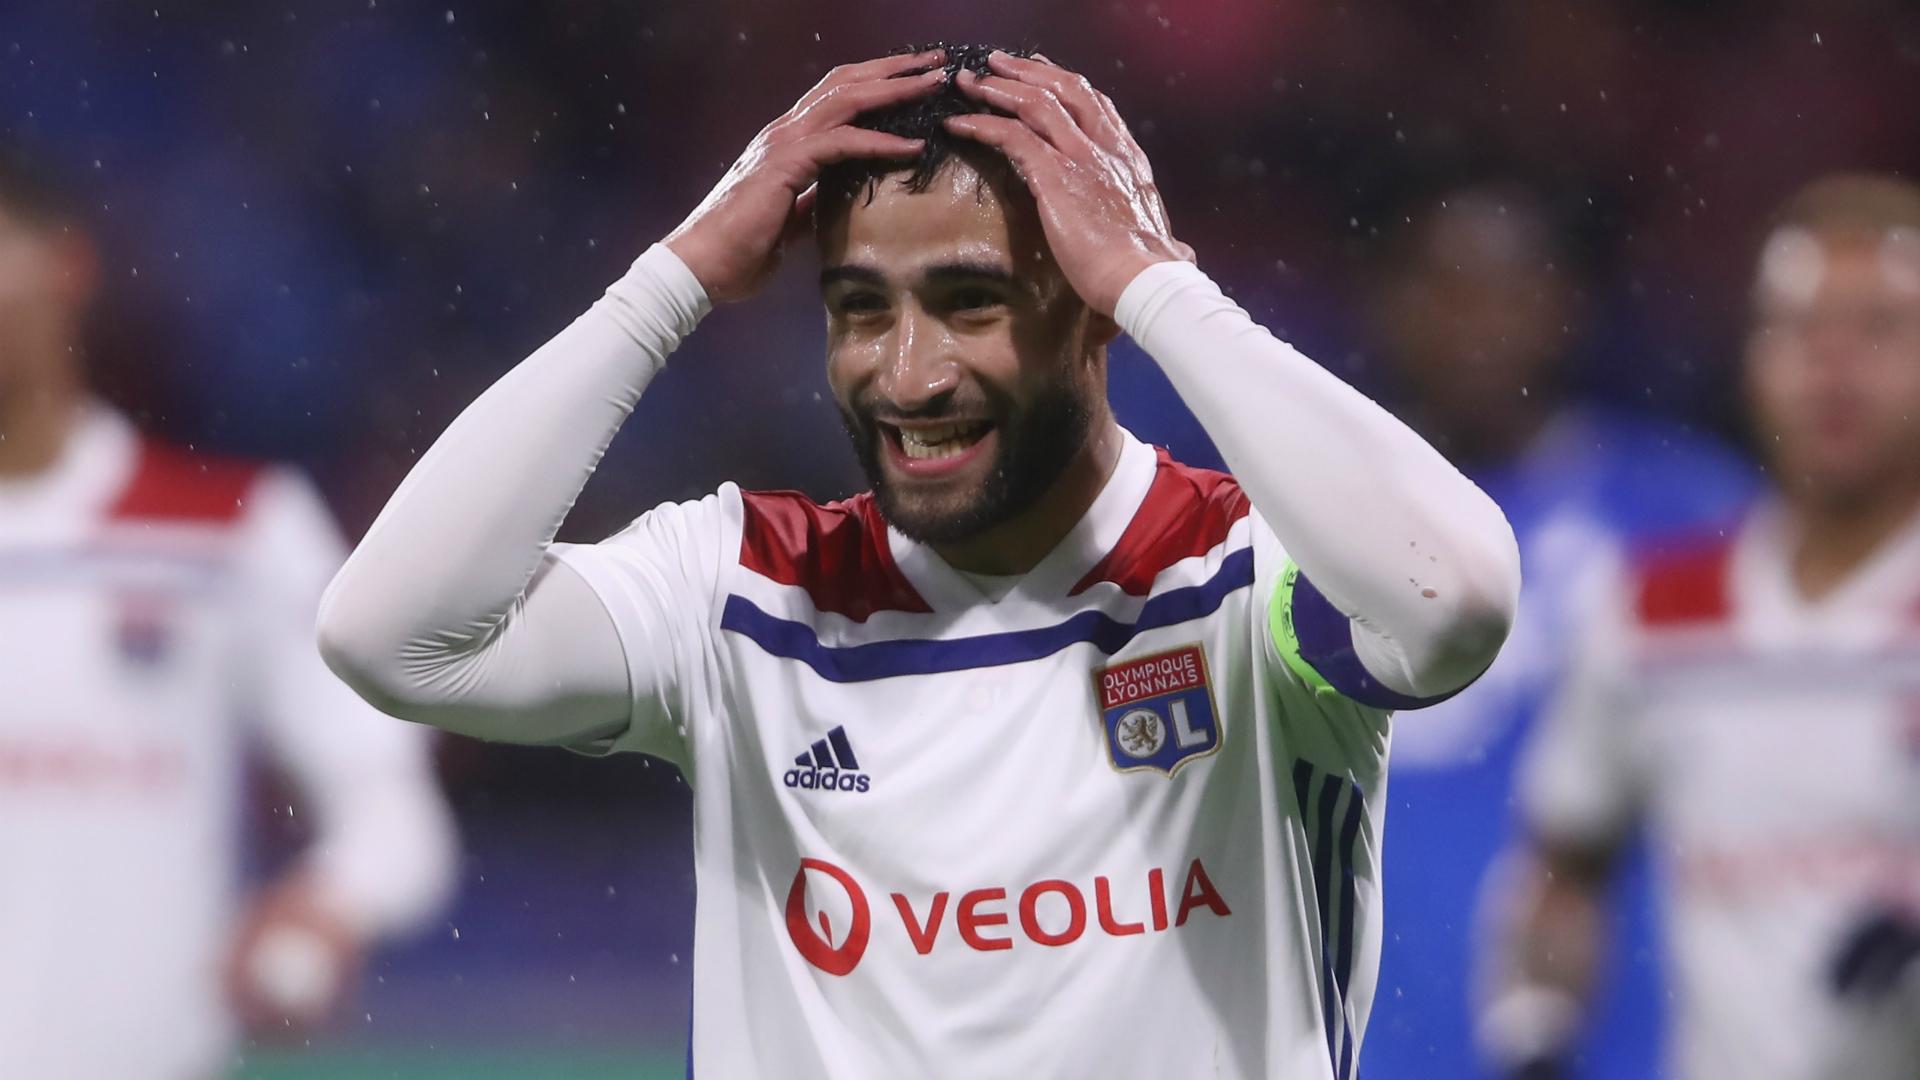 Lyon boss confirms Fekir 'negotiating transfer' amid talk of Betis move